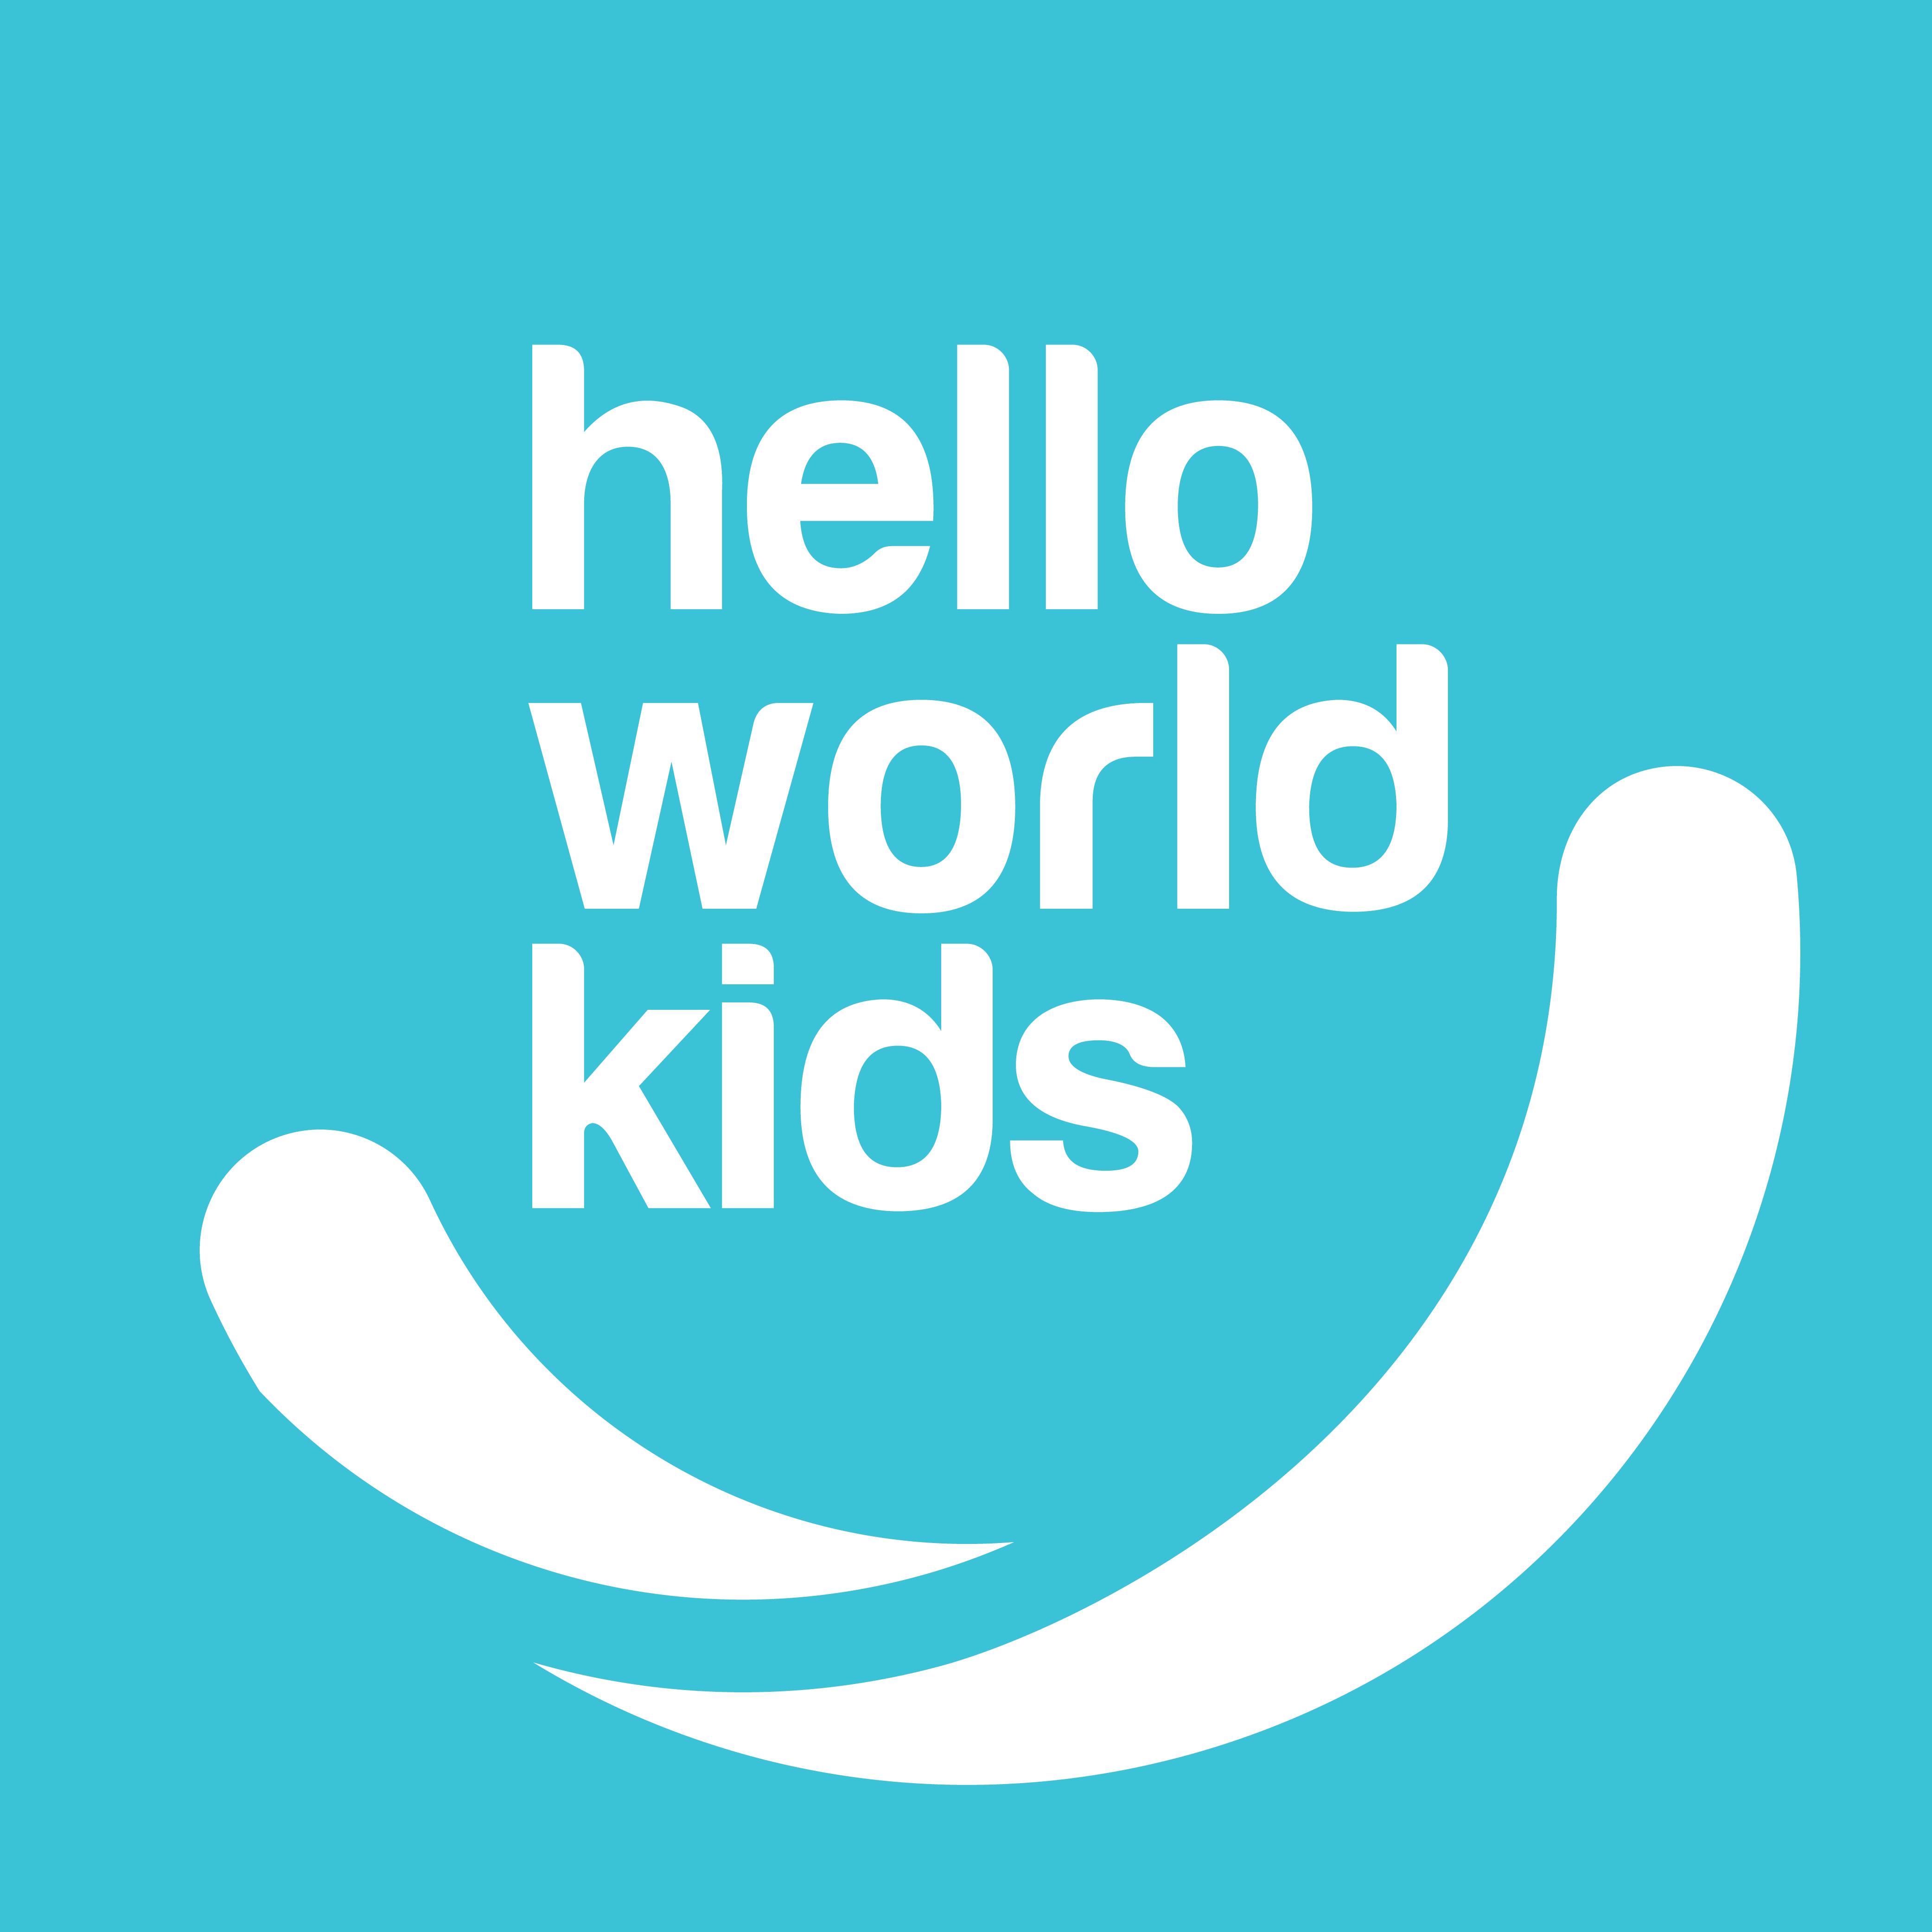 Hello World Kids